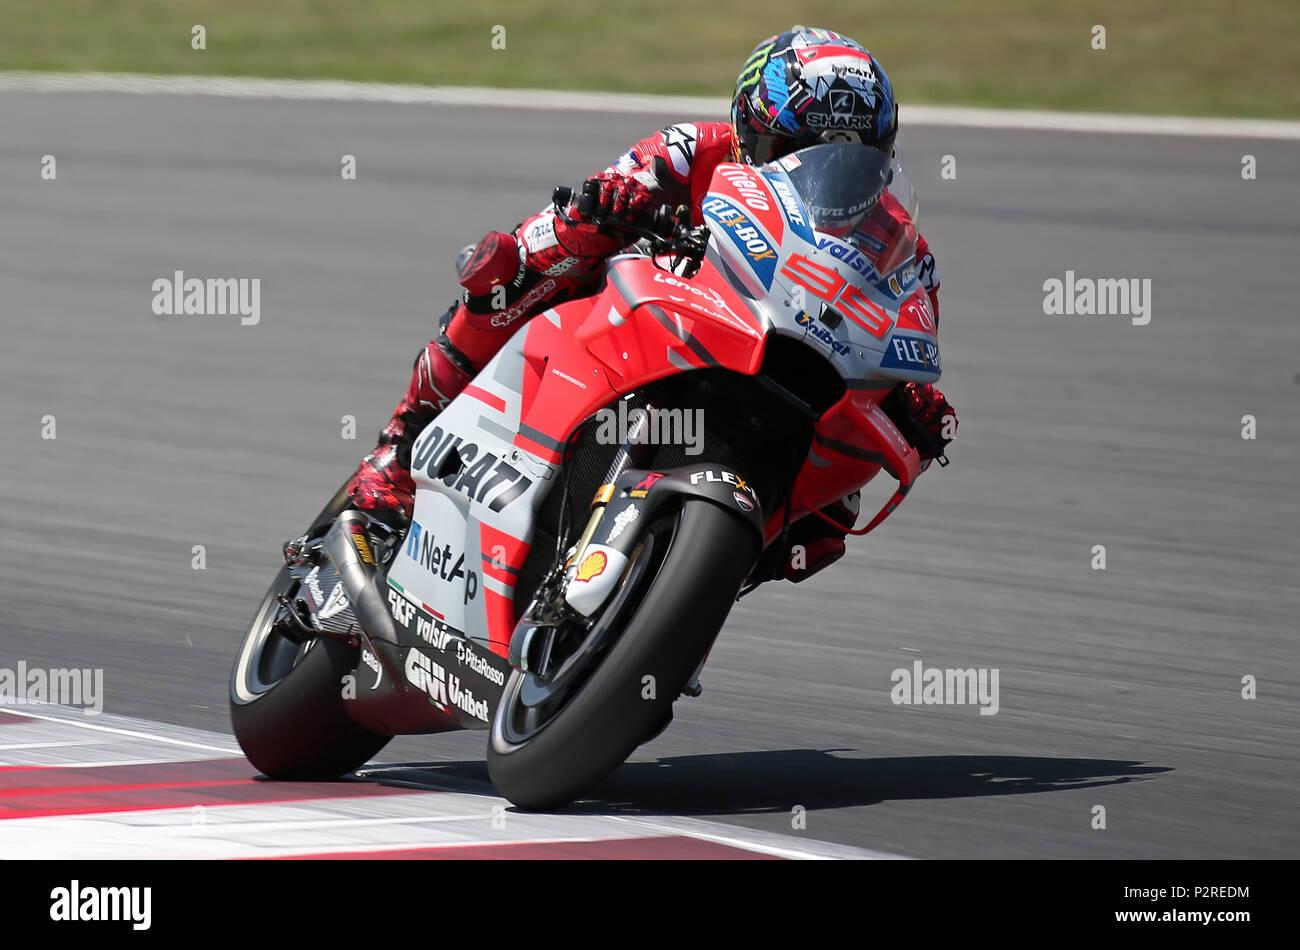 Barcelona -16th June 2018- SPAIN: Jorge Lorenzo (Ducati) during the qualifying of the GP Catalunya Moto GP, in the Barcelona-Catalunya Circuit, on 16th June 2018. Photo: Joan Valls/Urbanandsport/Cordon Press - Stock Image